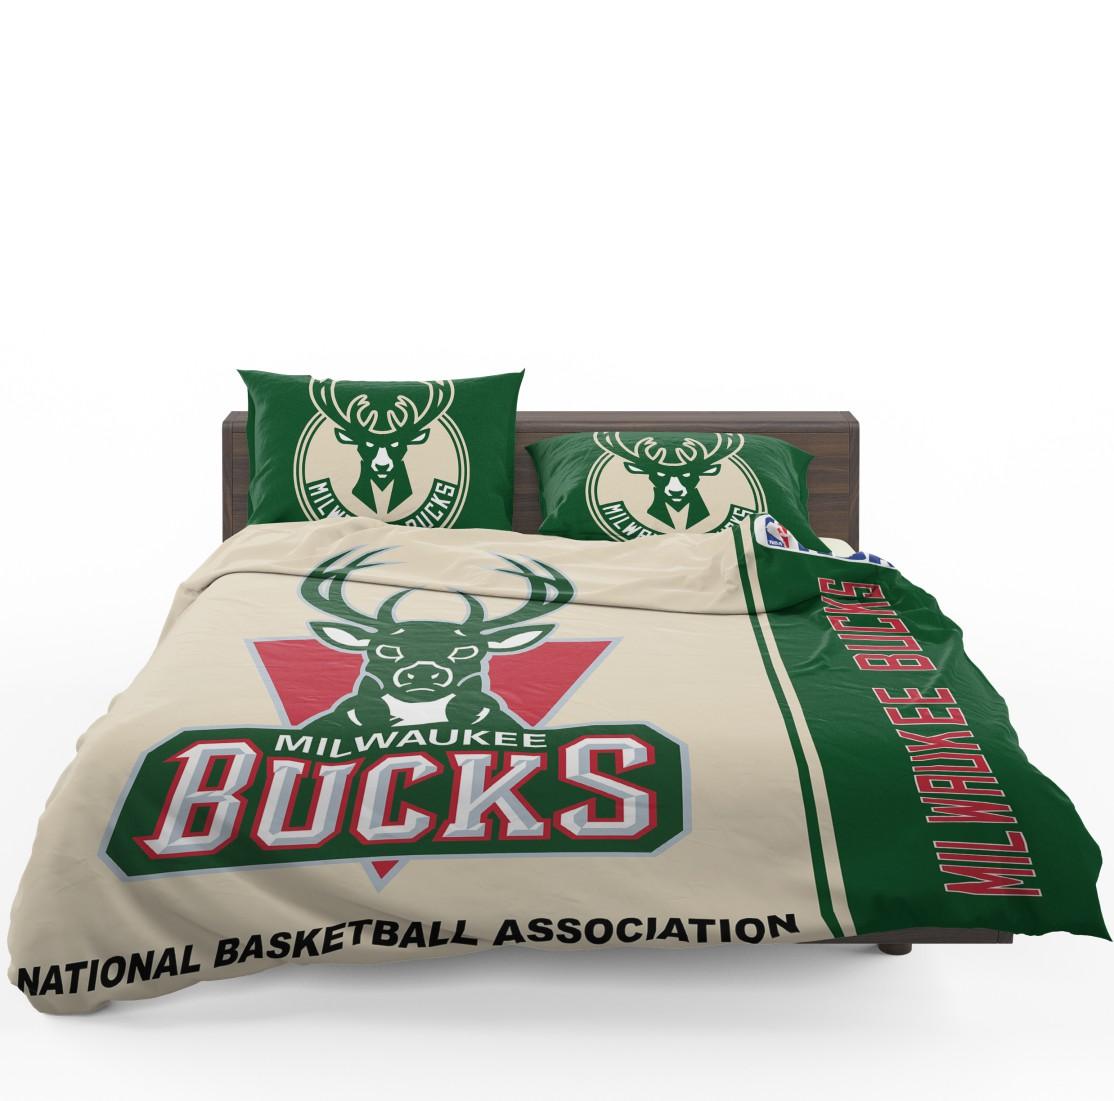 Milwaukee Bucks Nba Basketball Bedding Set Ebeddingsets